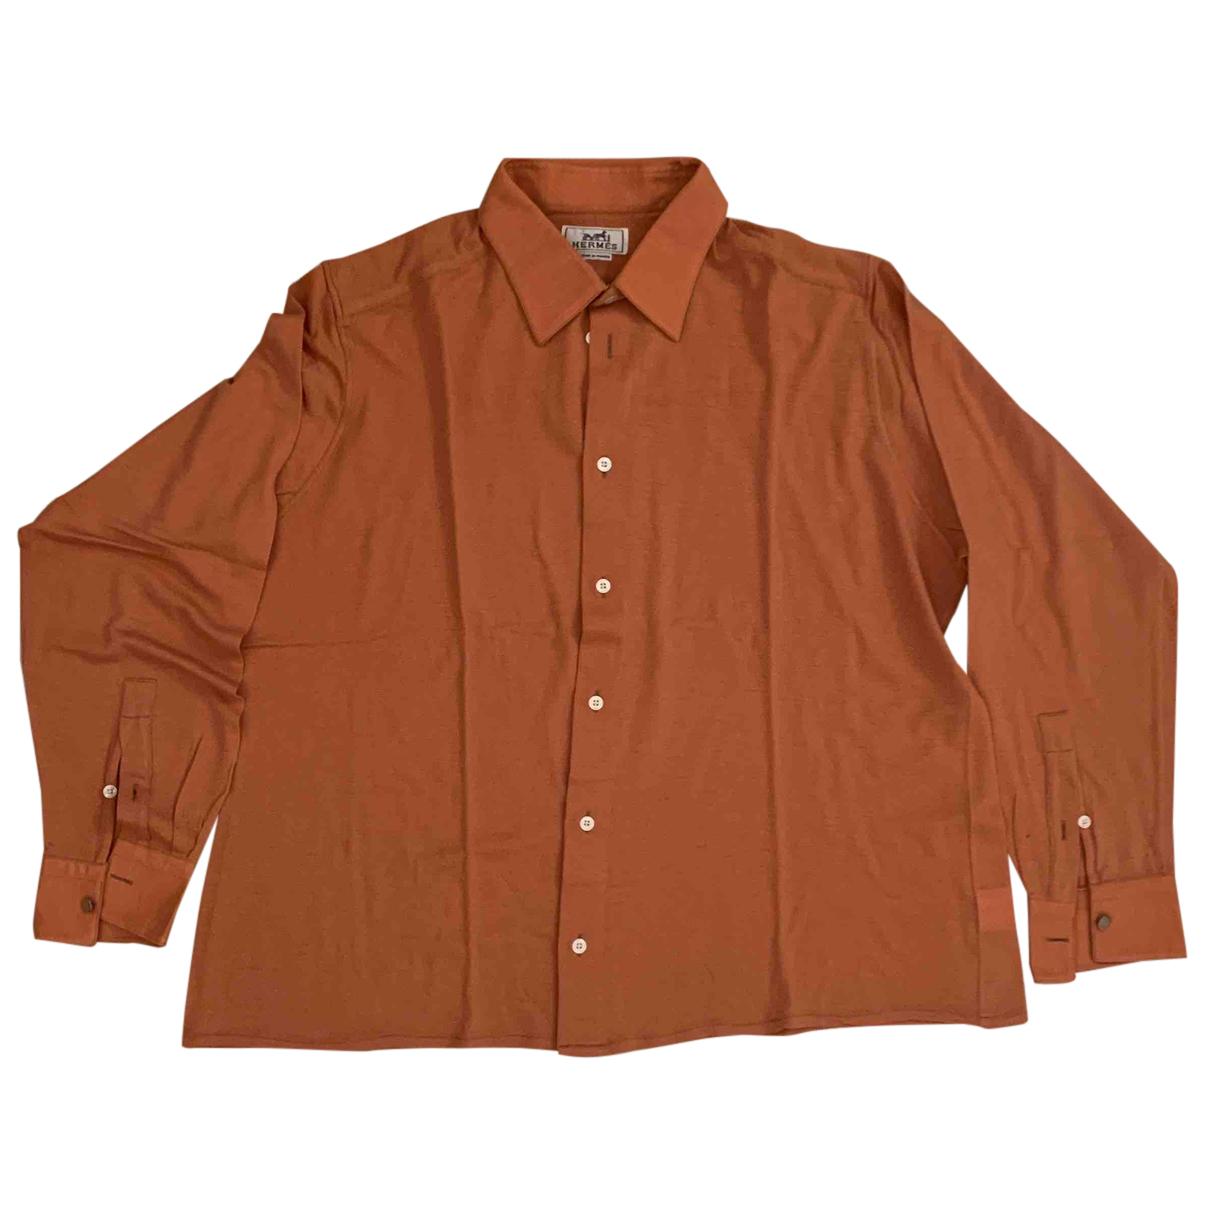 Camisas de Lana Hermes